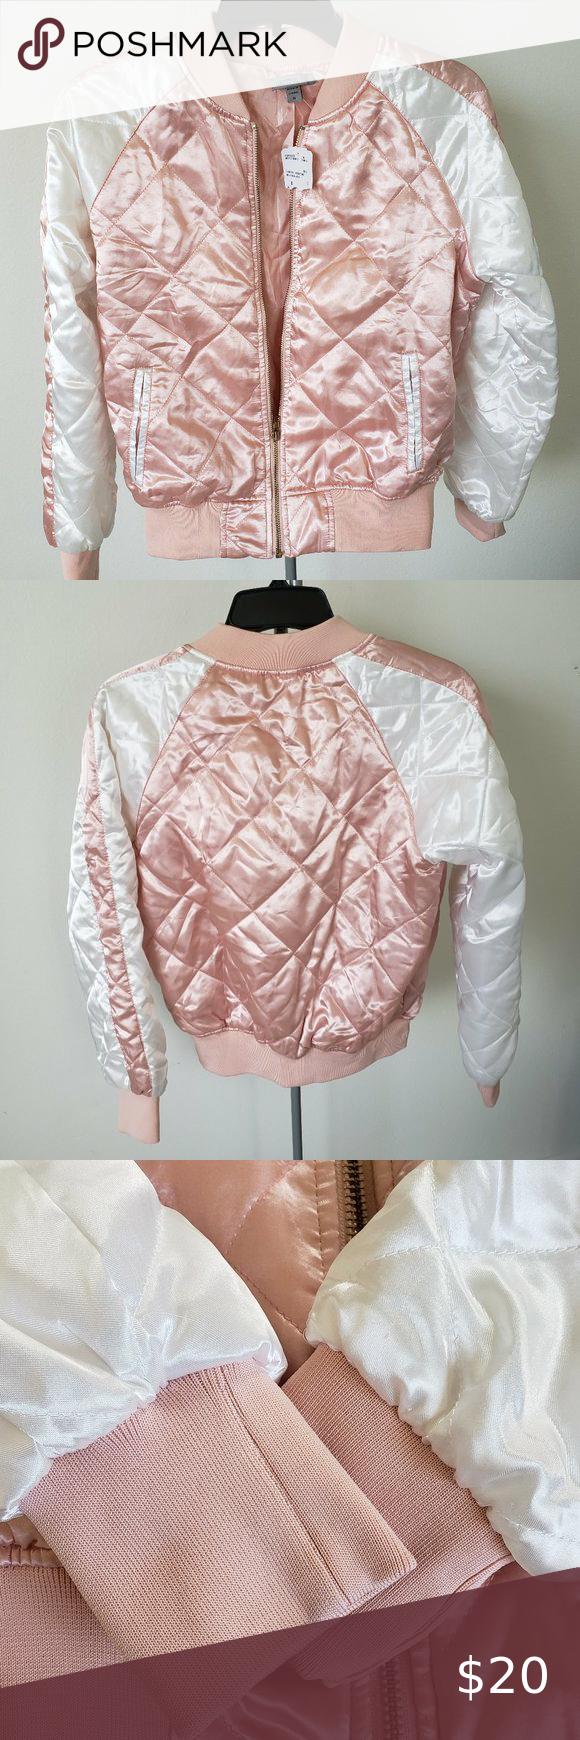 Cute Pink White Satin Bomber Jacket Small Nwt Satin Bomber Jacket Black Faux Leather Jacket Lace Bomber Jacket [ 1740 x 580 Pixel ]